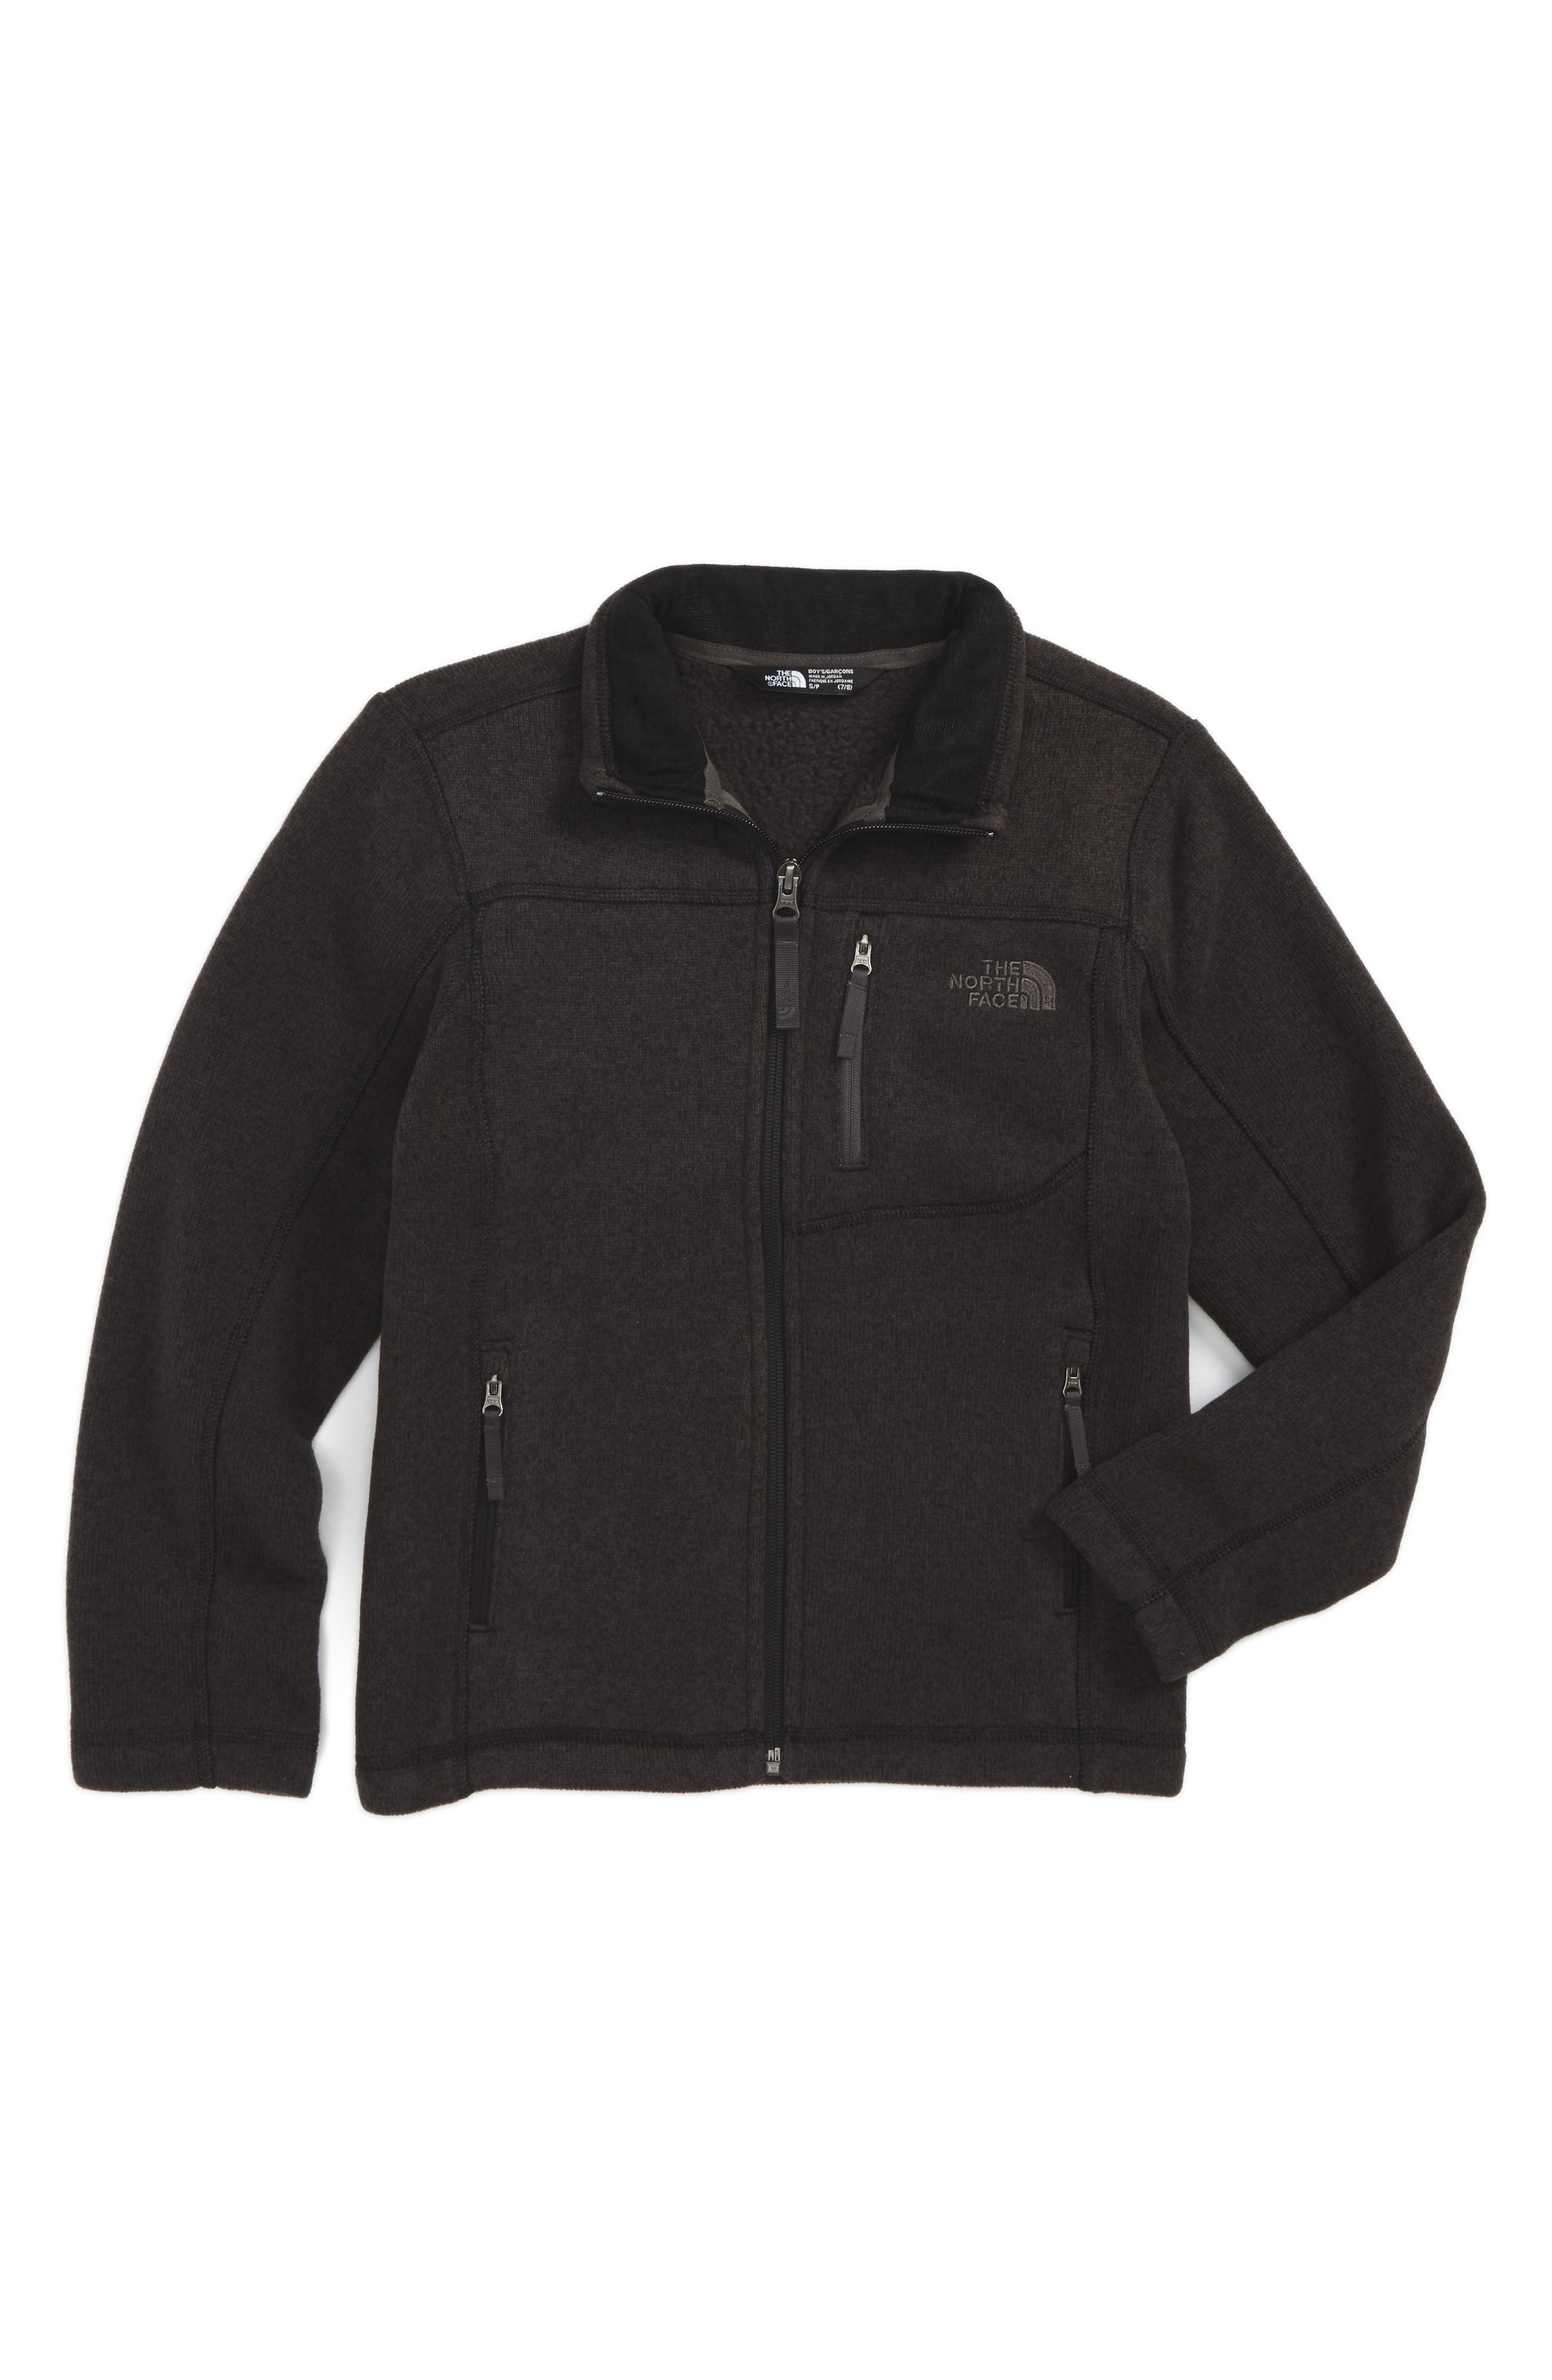 The North Face Gordon Lyons Sweater Fleece Zip Jacket (Big Boys)